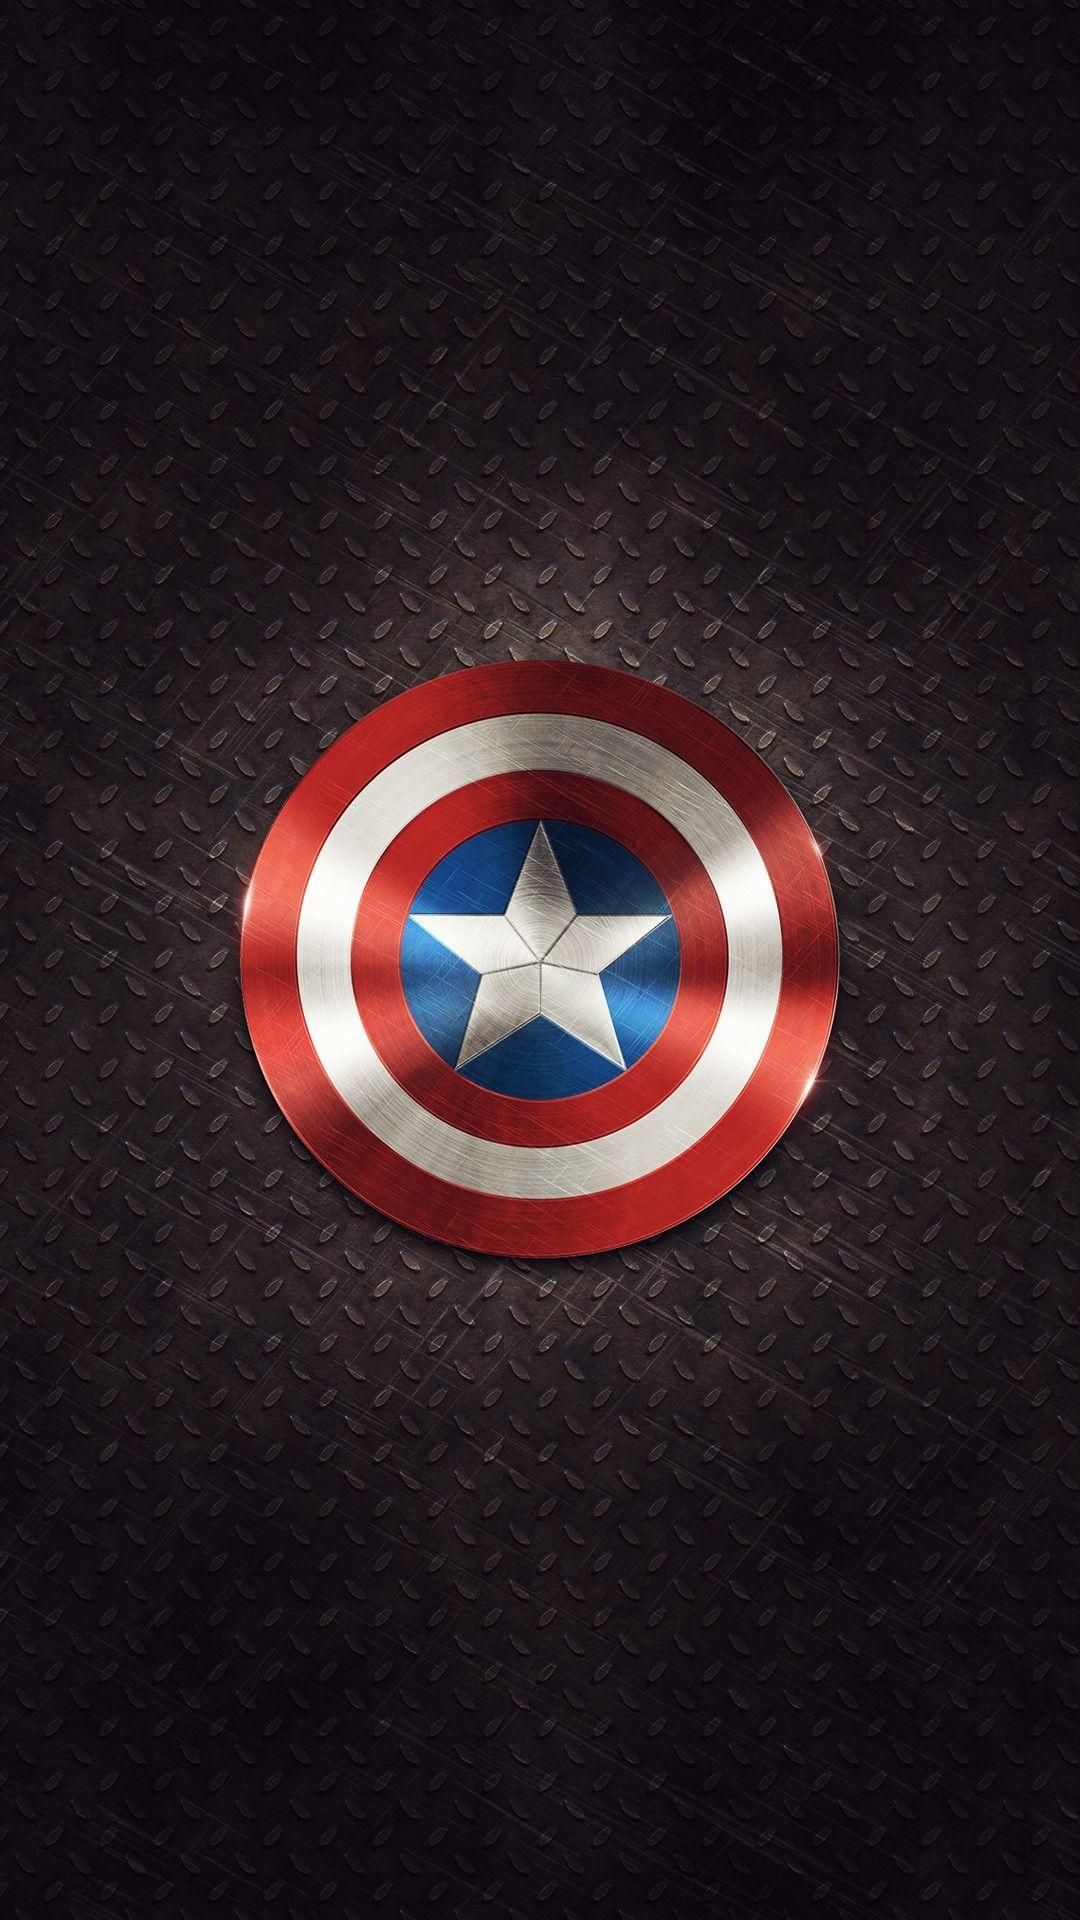 Superhero Mobile Wallpapers Top Free Superhero Mobile Backgrounds Wallpaperaccess